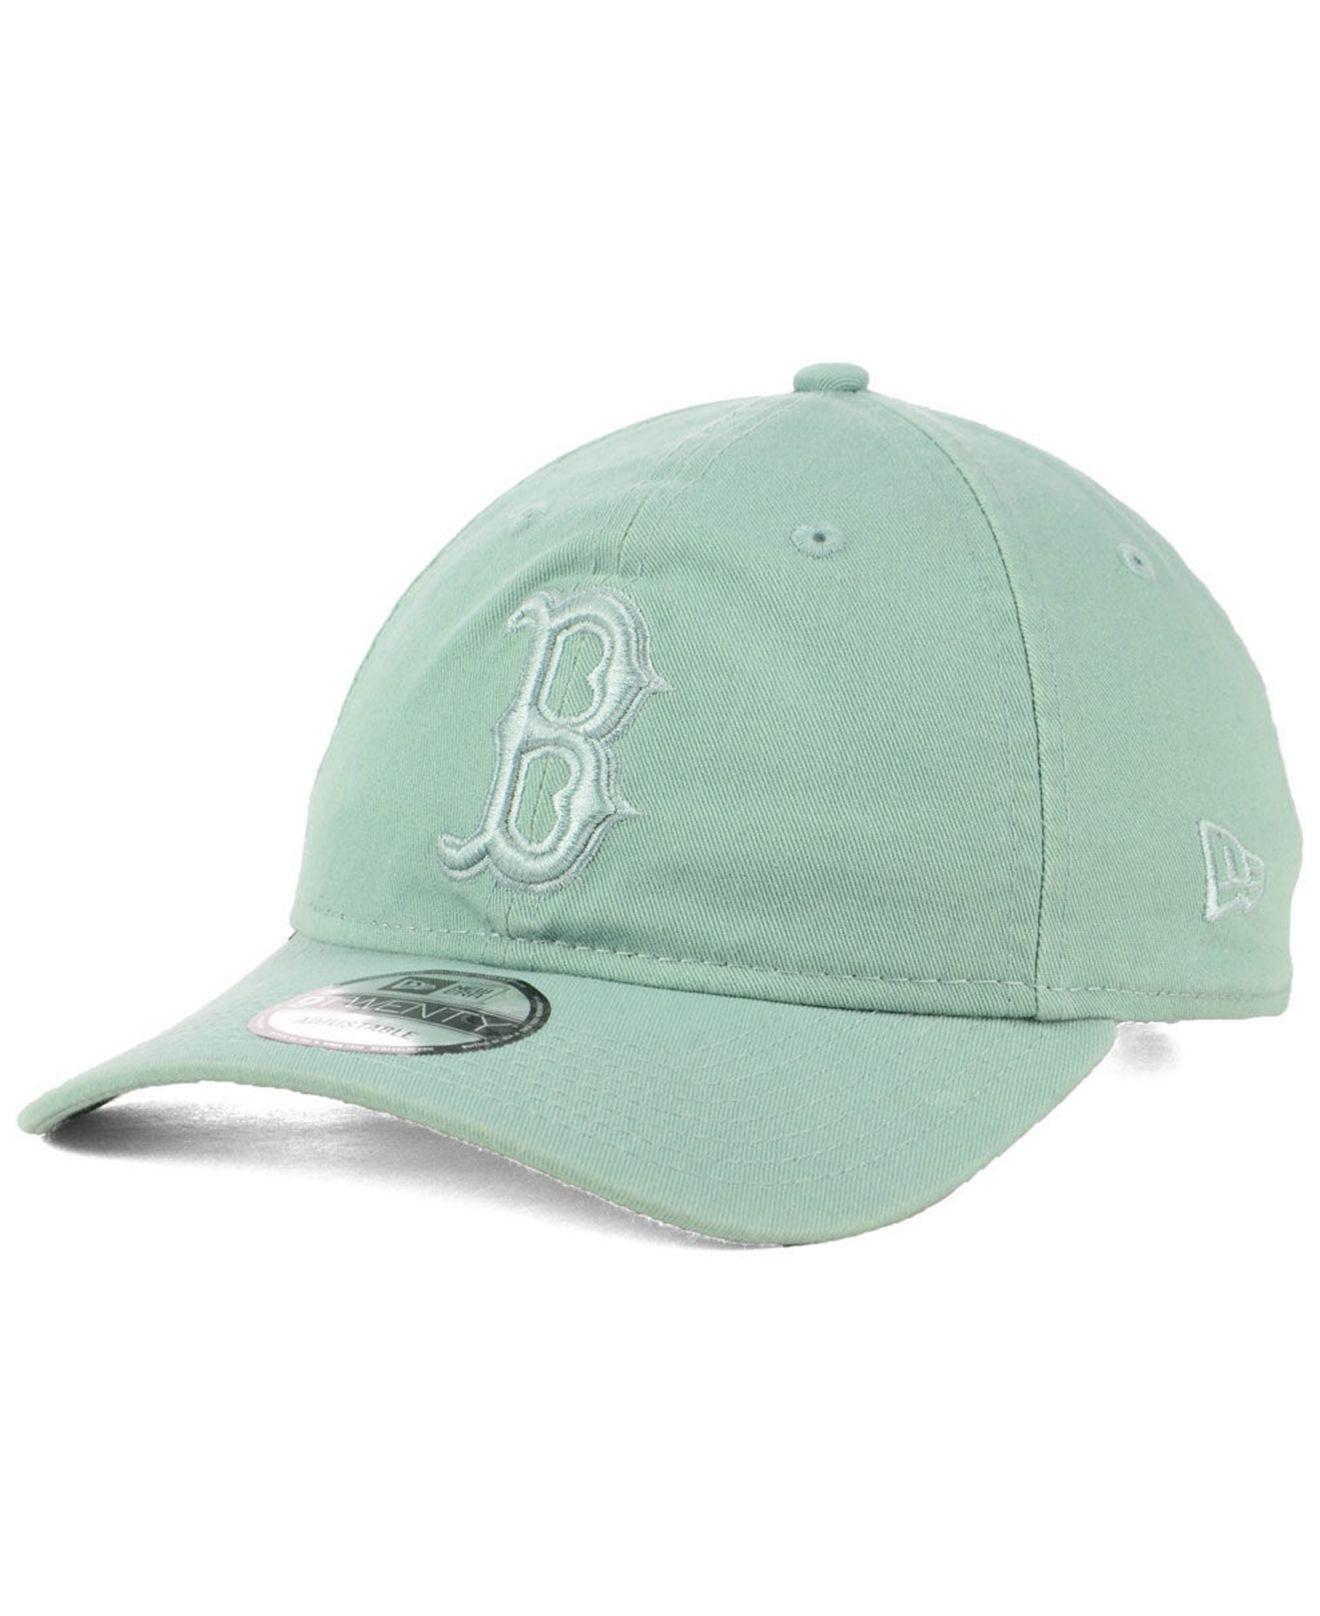 designer fashion f0f4e 87a6c discount ktz. mens blue boston red sox spring classic 9twenty cap 7c73d  6ed89